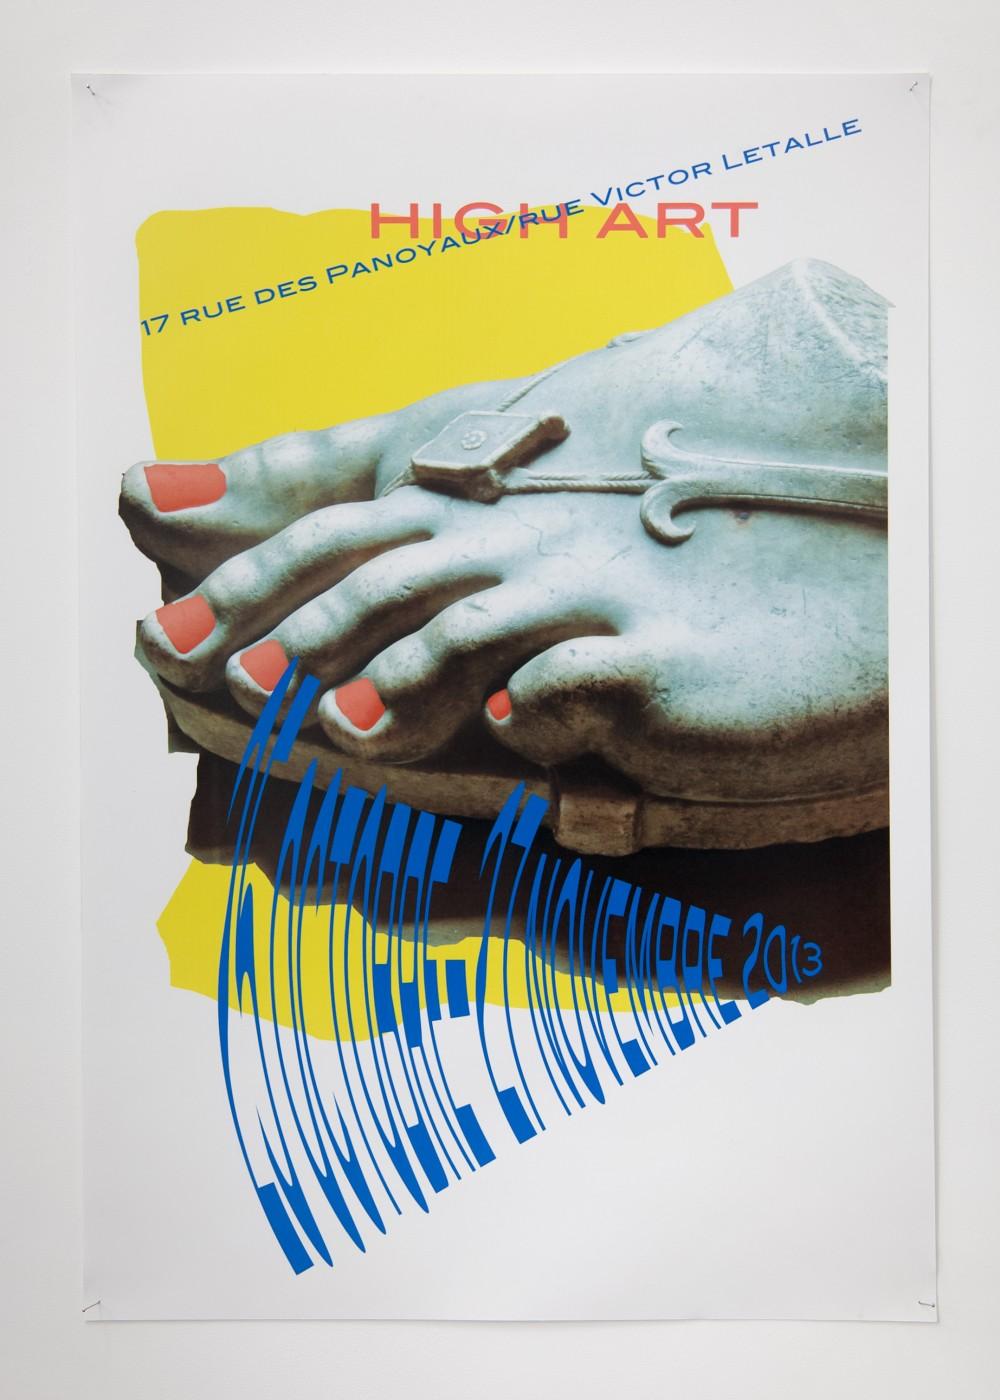 ♥ Allison Katz,  High Art , 2013   Inkjet on poster   60 x 40 cm / 23.6 x 15.7 in OLGA BALEMA  DAVID DOUARD  ALLISON KATZ  BRADLEY KRONZ  TOM HUMPHRIES  HAN-CHRISTIAN LOTZ  LAURE PROUVOST